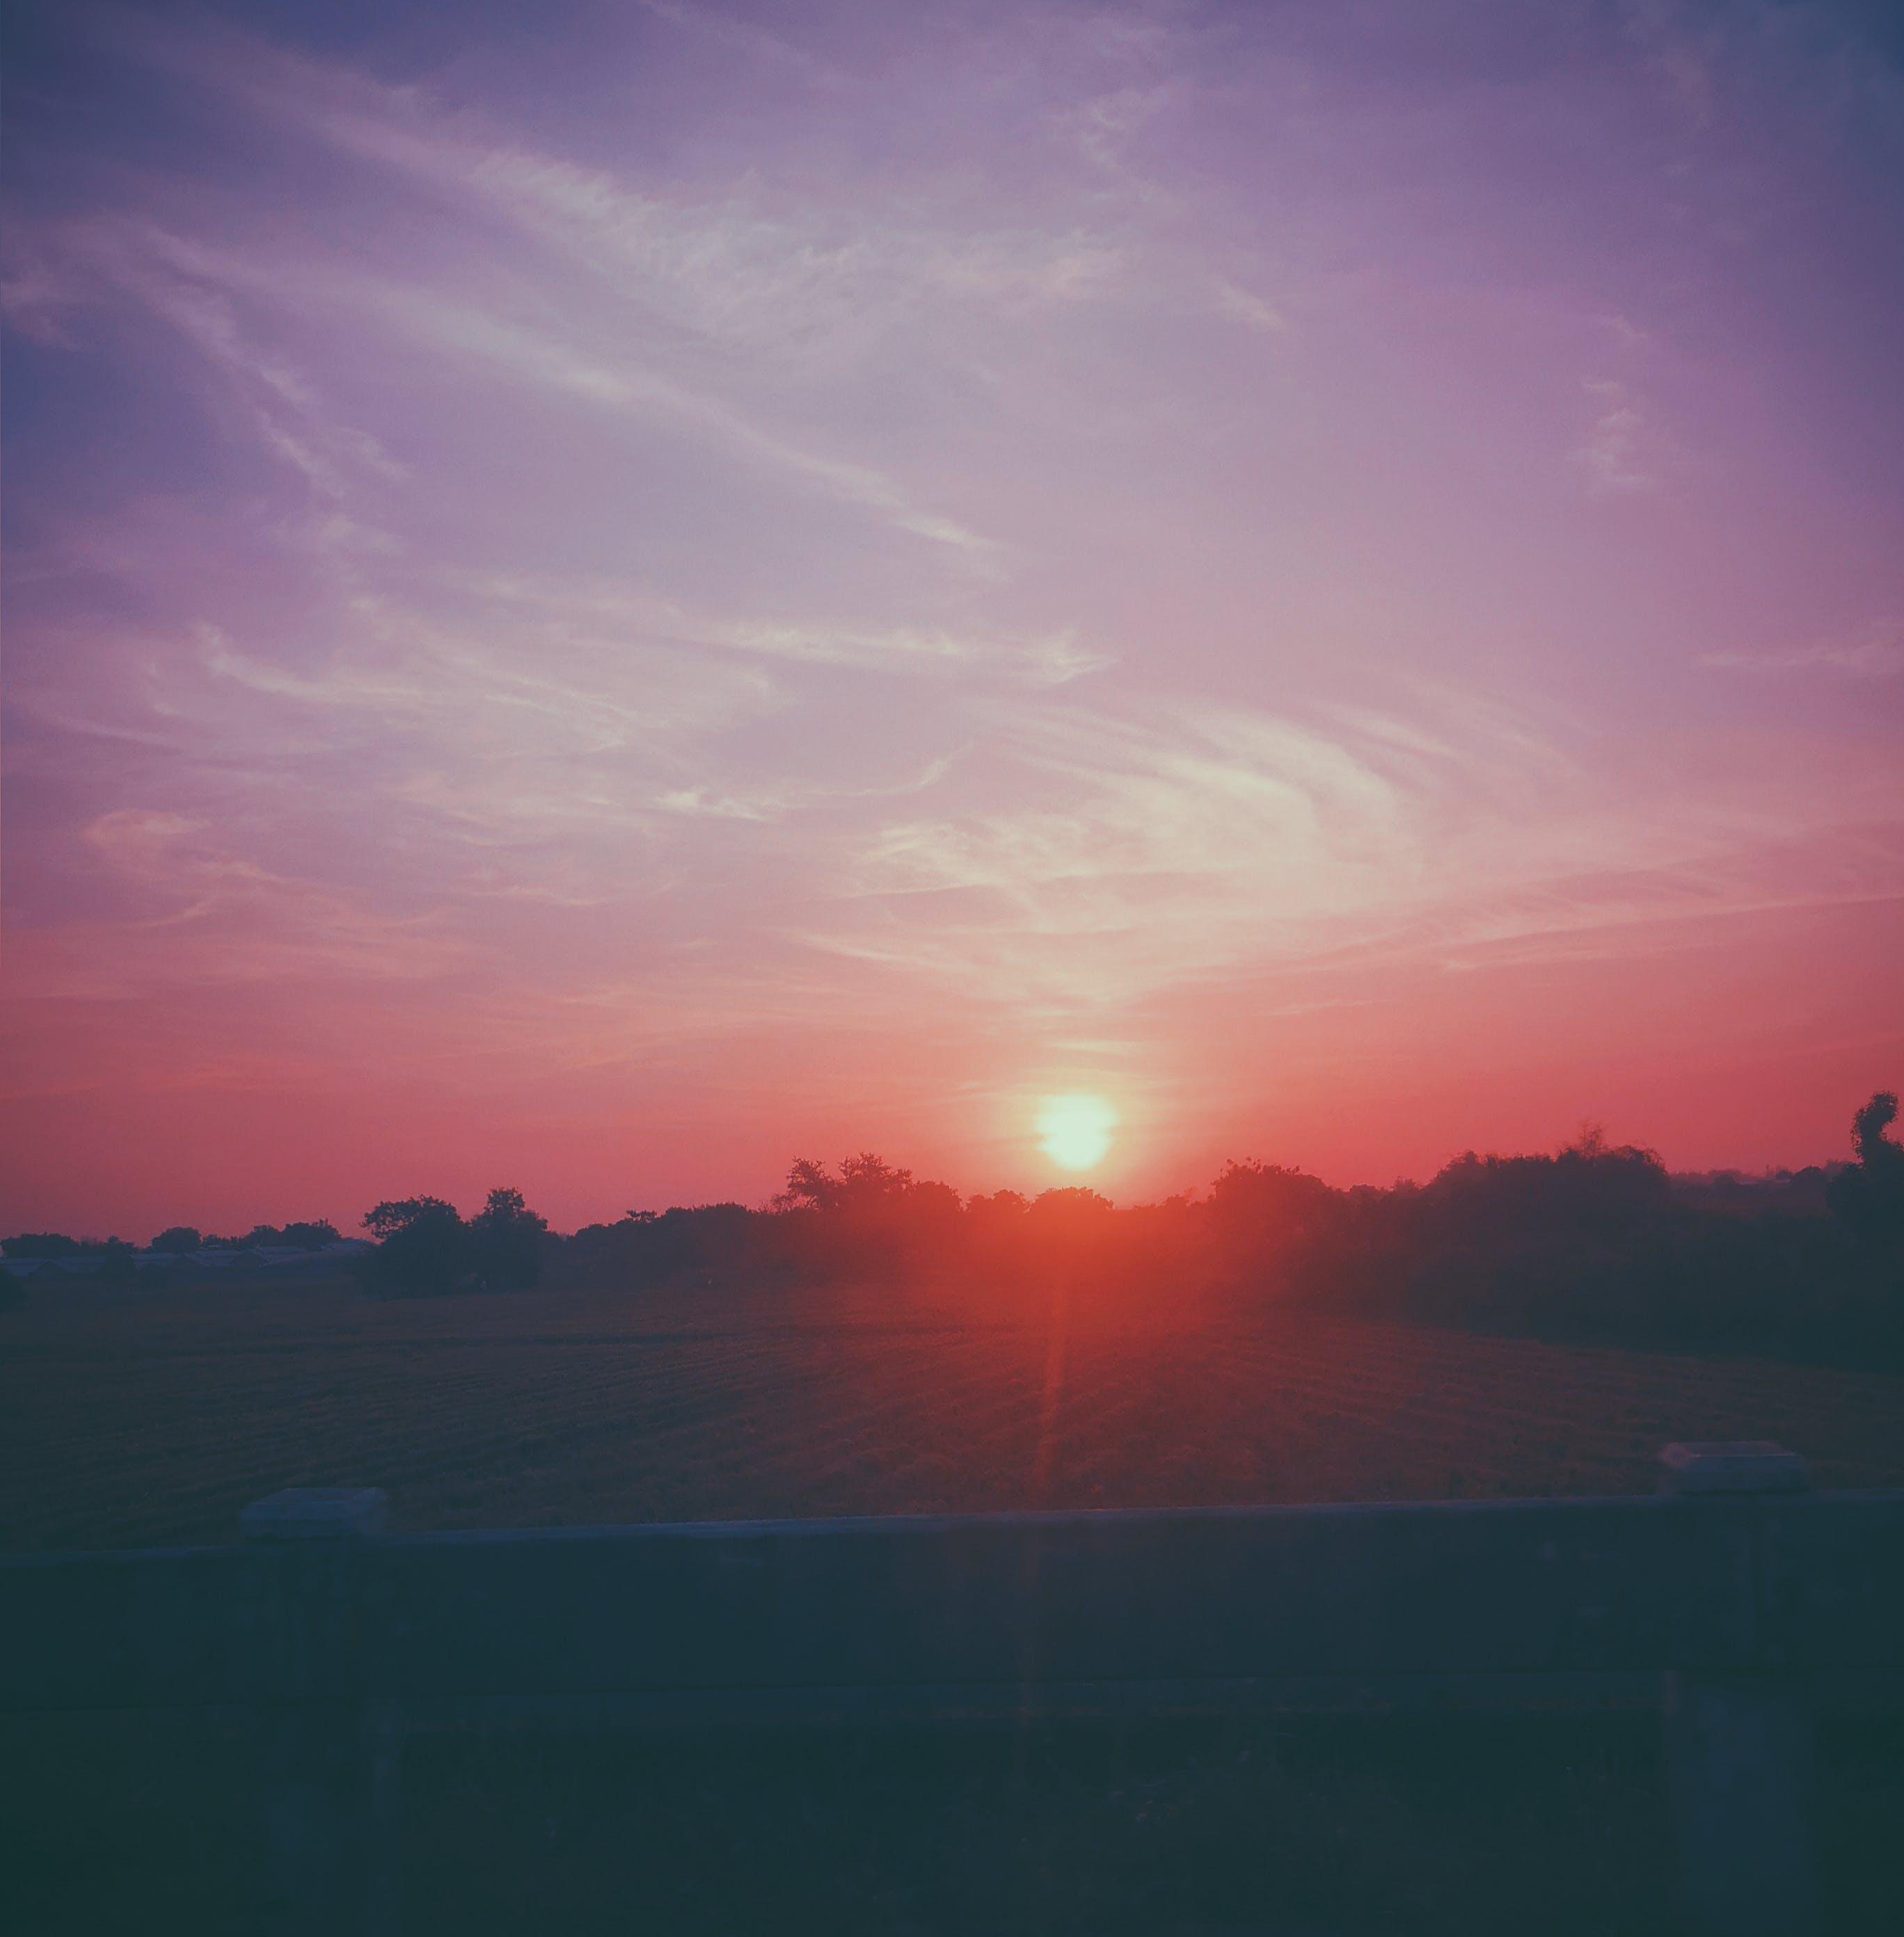 Free stock photo of #mobilechallenge, #nature, sunrise, vsco